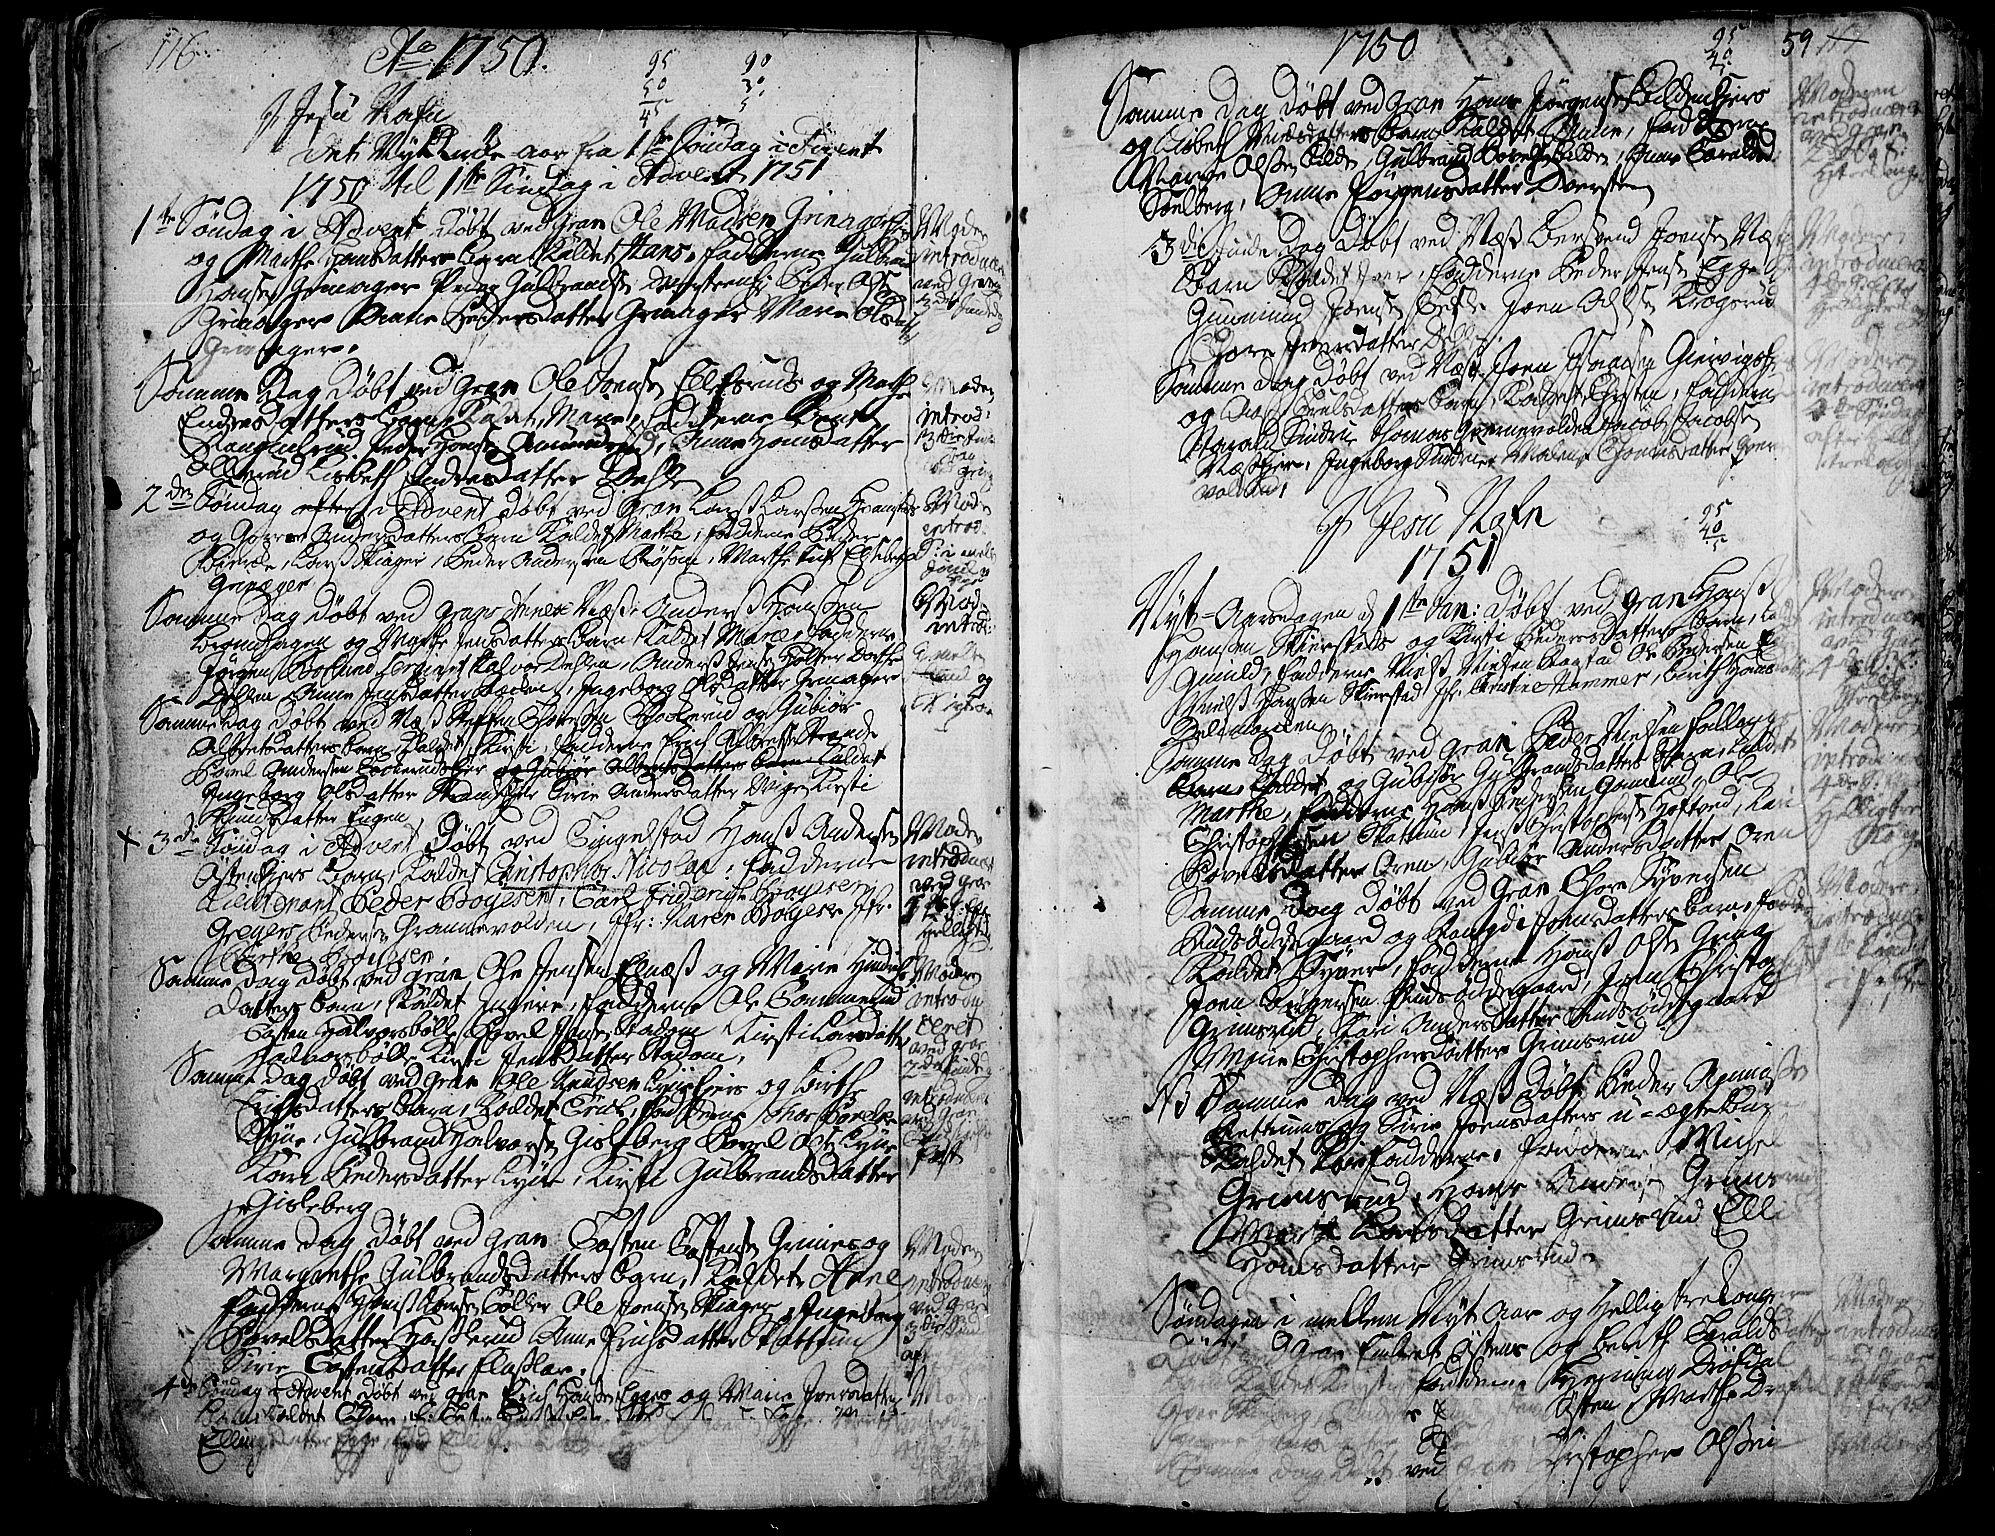 SAH, Gran prestekontor, Ministerialbok nr. 3, 1745-1758, s. 59